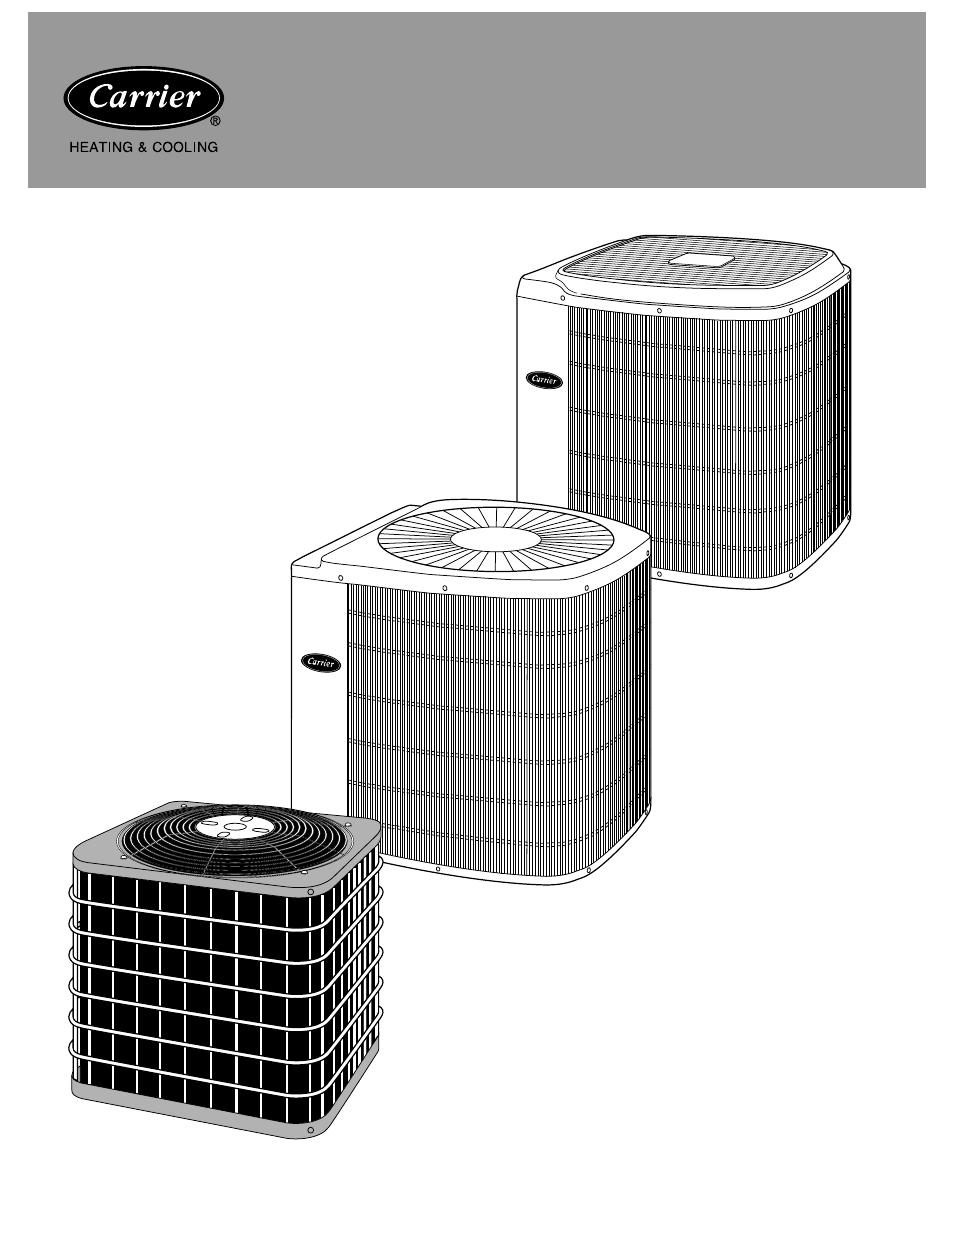 Carrier 38CKC042 Air User Manual | 8 pages | Also for: 38CKC048, 38CKC036  Air